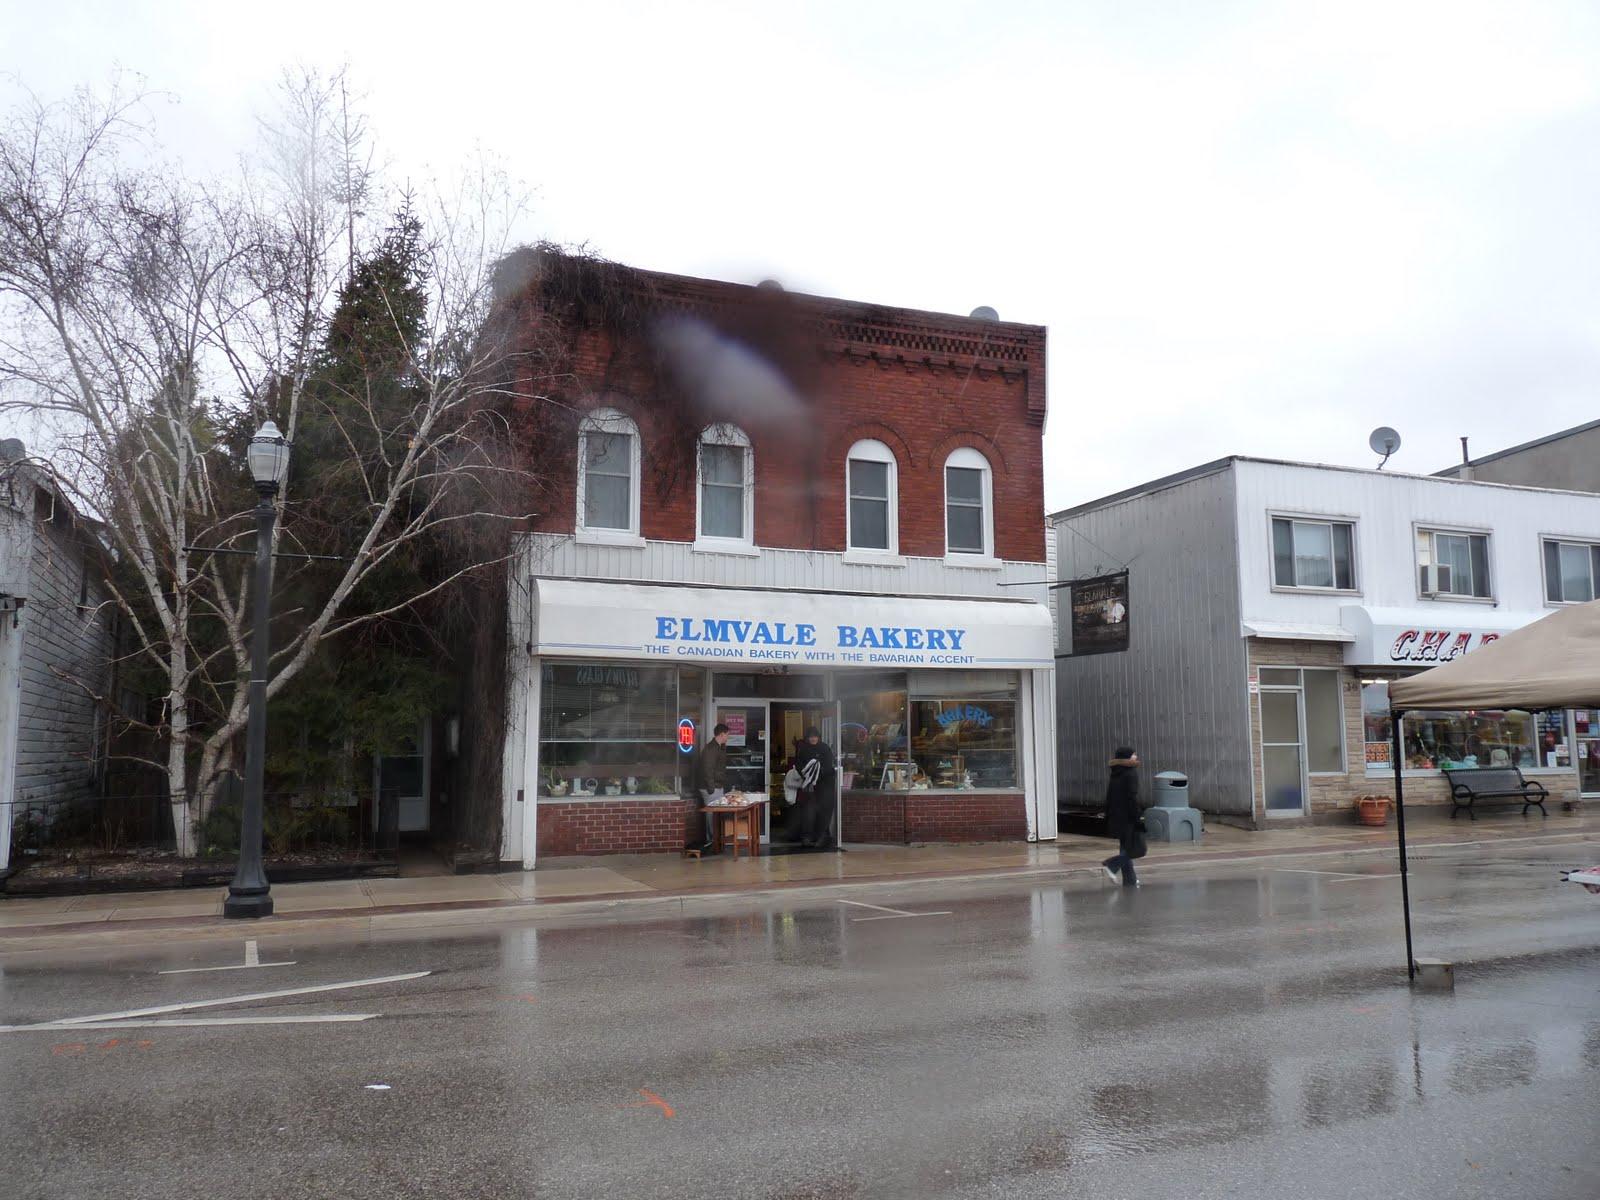 Seasonal Ontario Food: A Visit to Elmvale Maple Syrup Festival